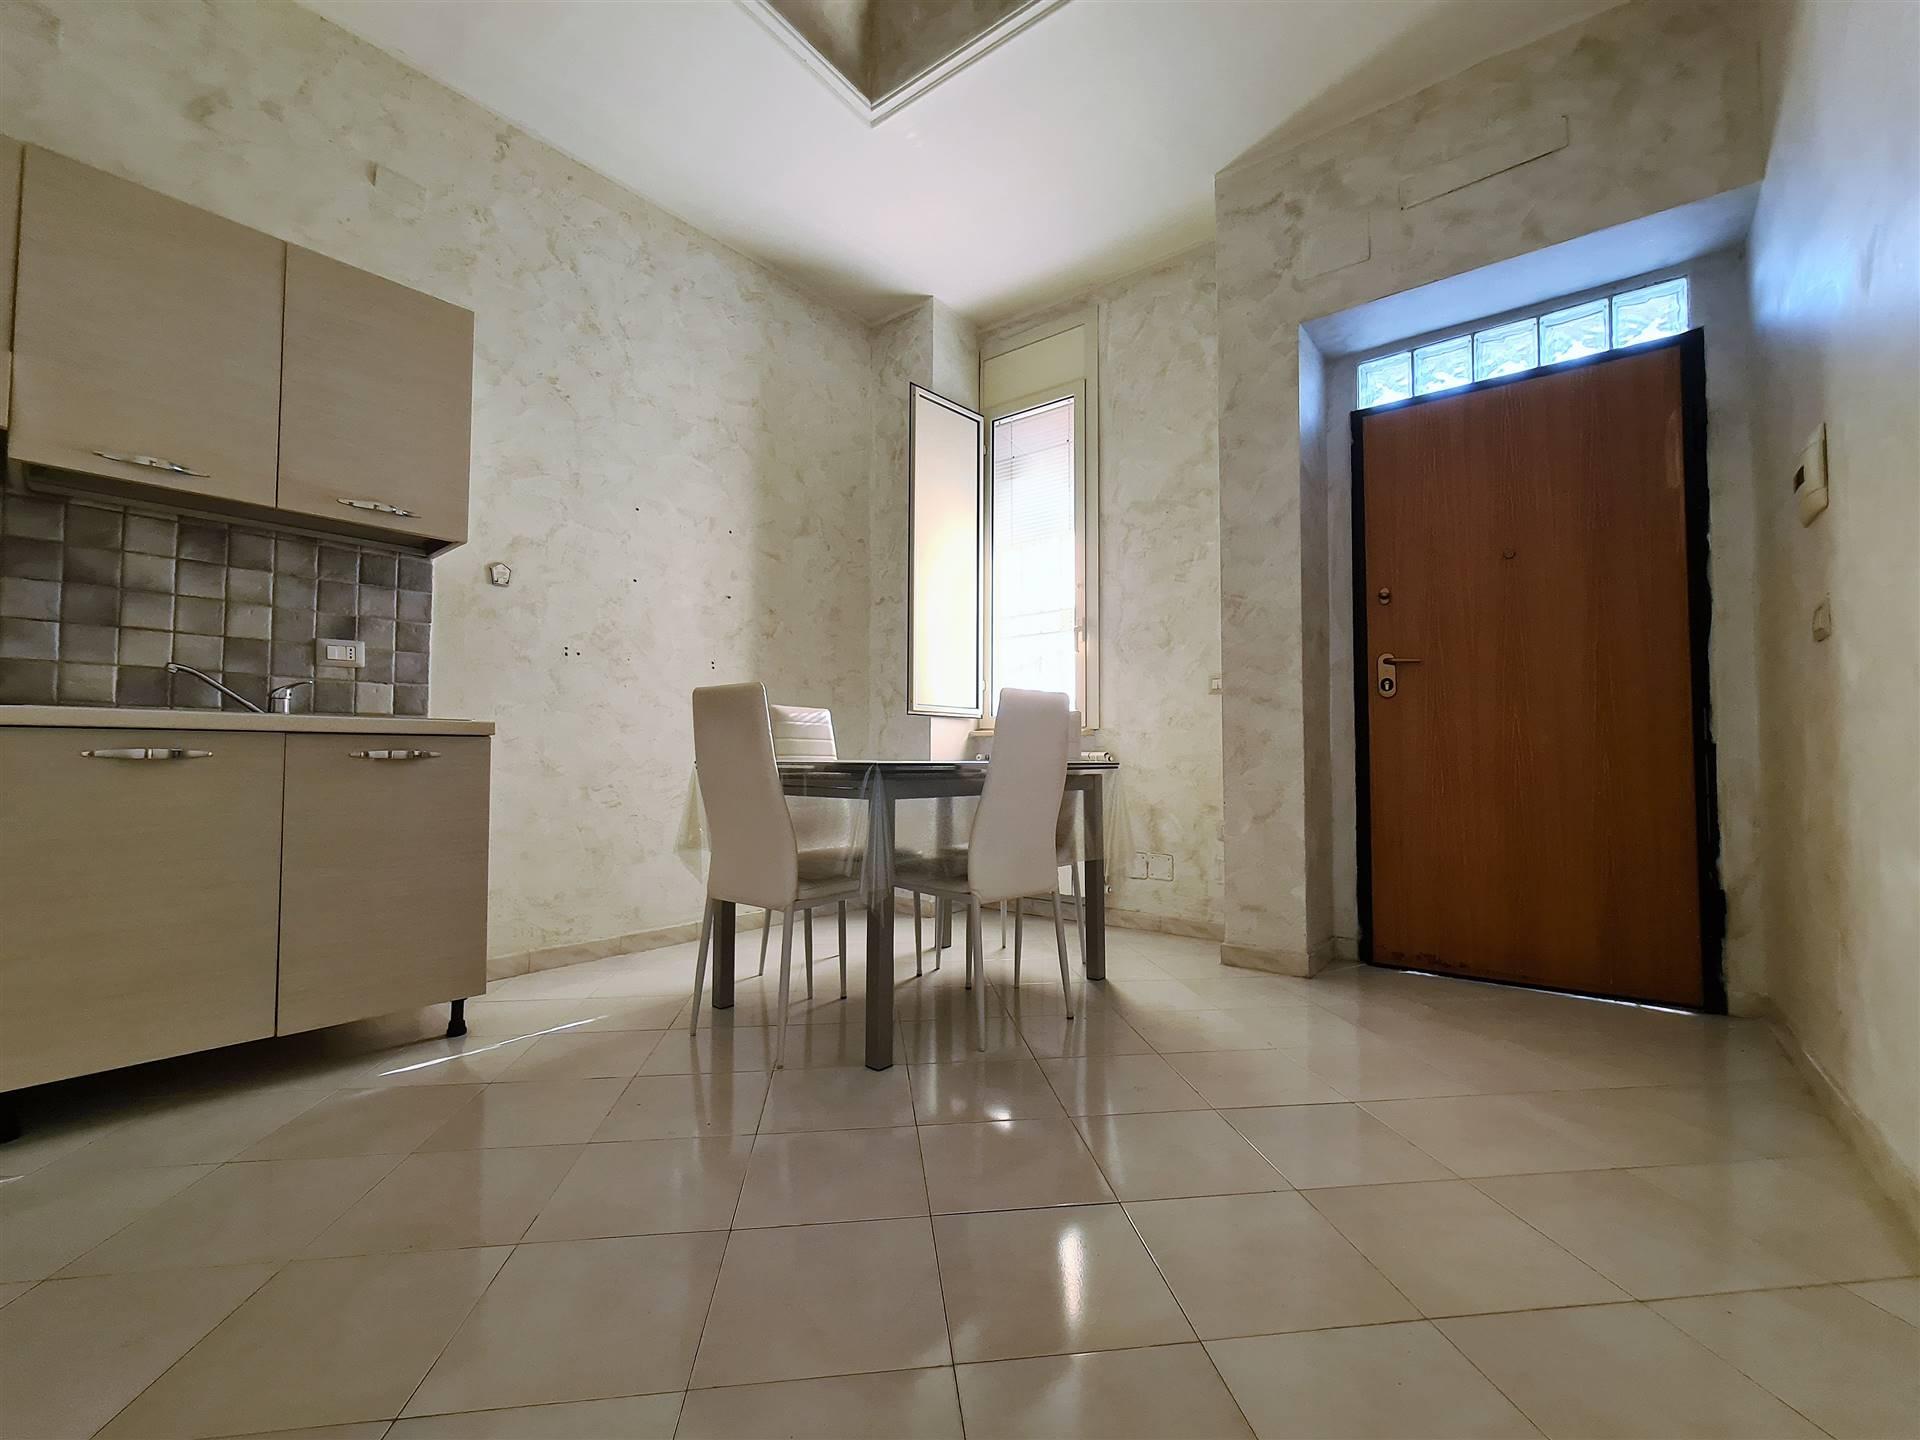 AV839B-Appartamento-SANTA-MARIA-CAPUA-VETERE-Via-degli-Orti